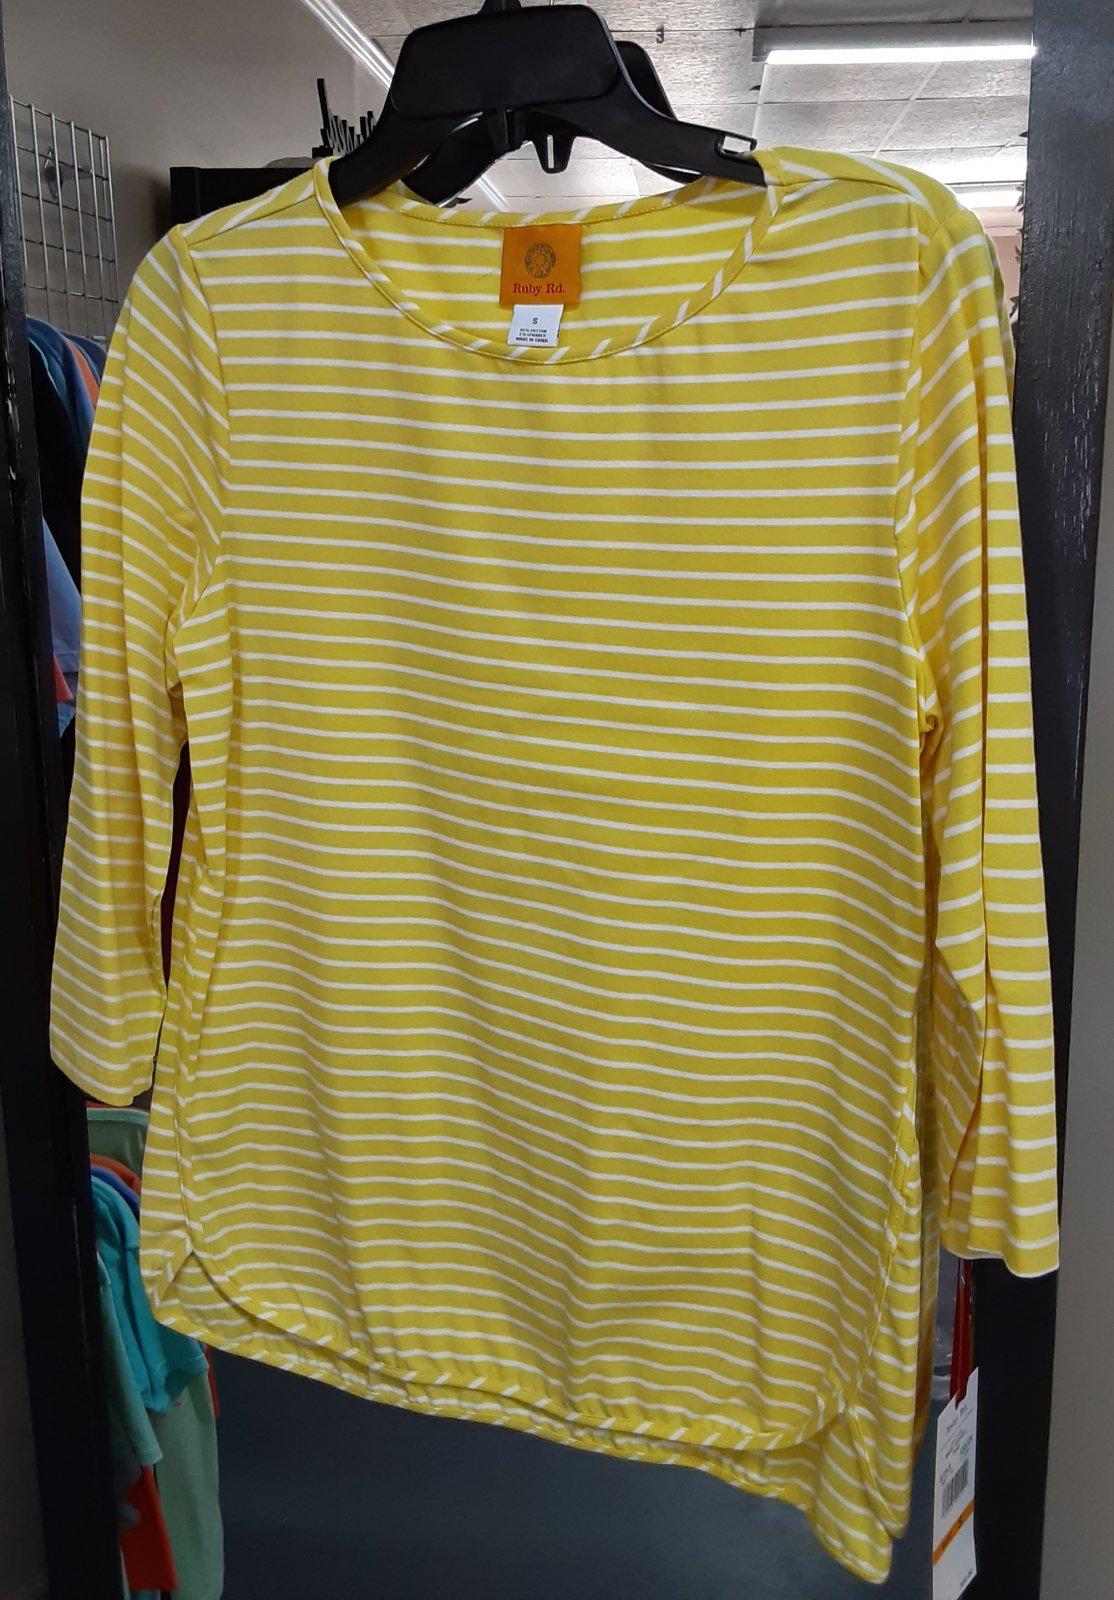 Ruby Rd. Yellow Stripe Top